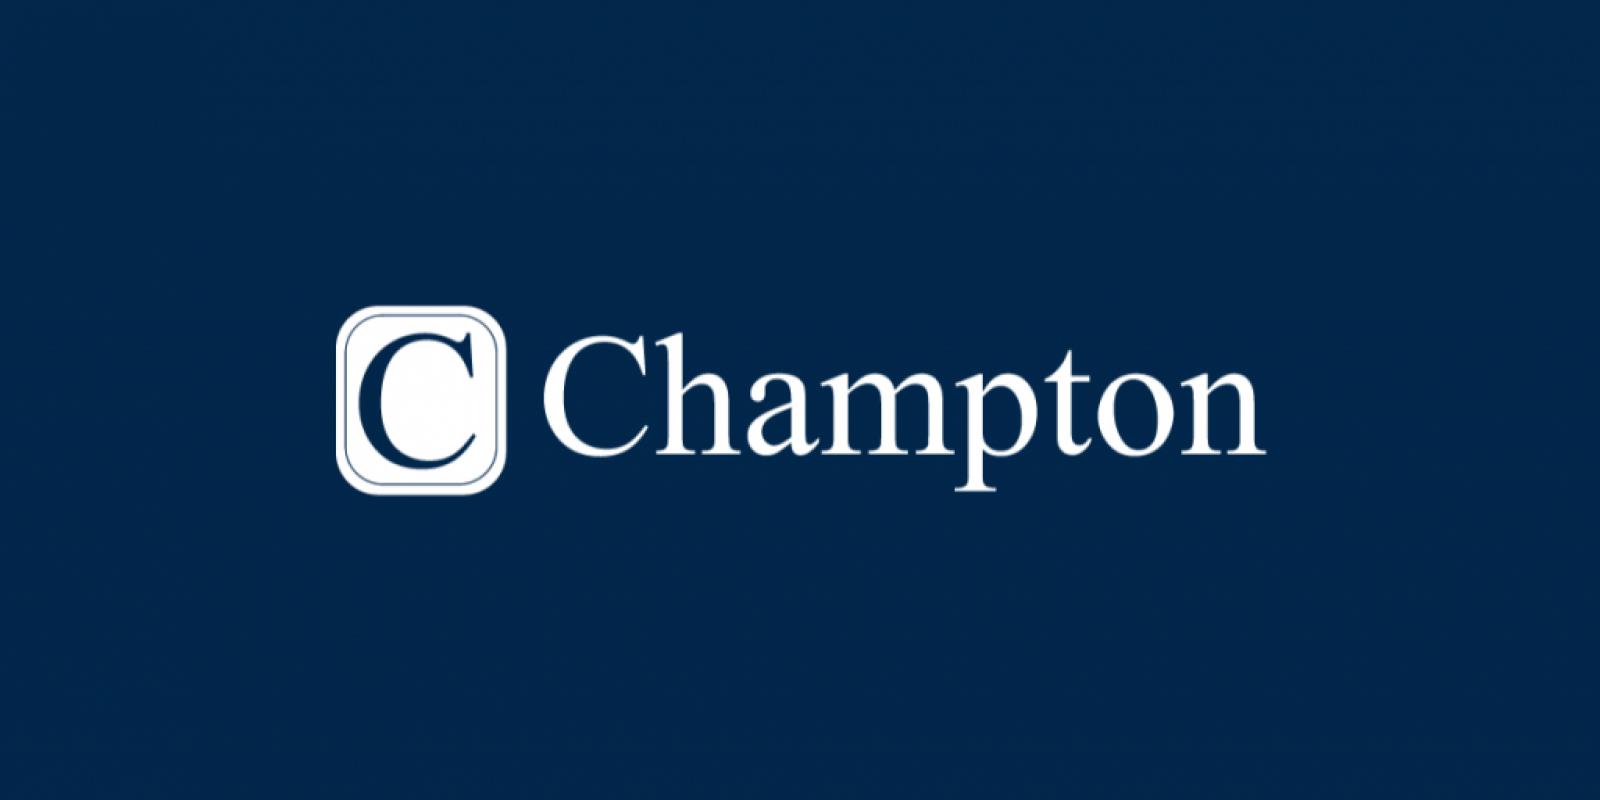 added-to-capital-one-financial-corp-(cof),-verizon-communications-inc-(vz),-and-berkshire-hathaway-inc-(brk.b)